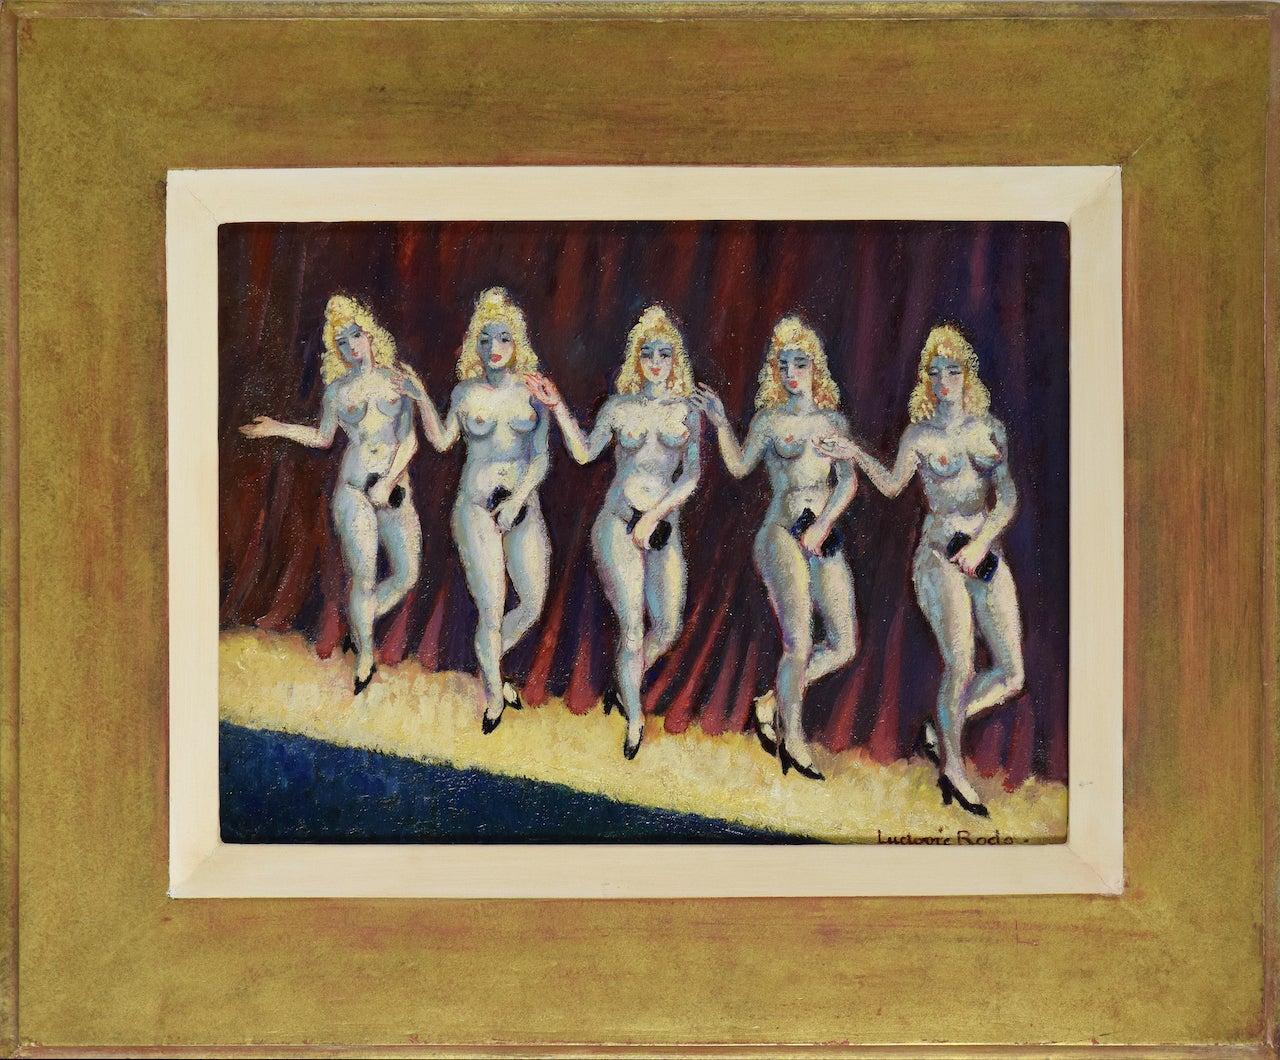 Cabaret Dancers (Cinq Sacs à Mains) by Ludovic-Rodo Pissarro, School of Paris